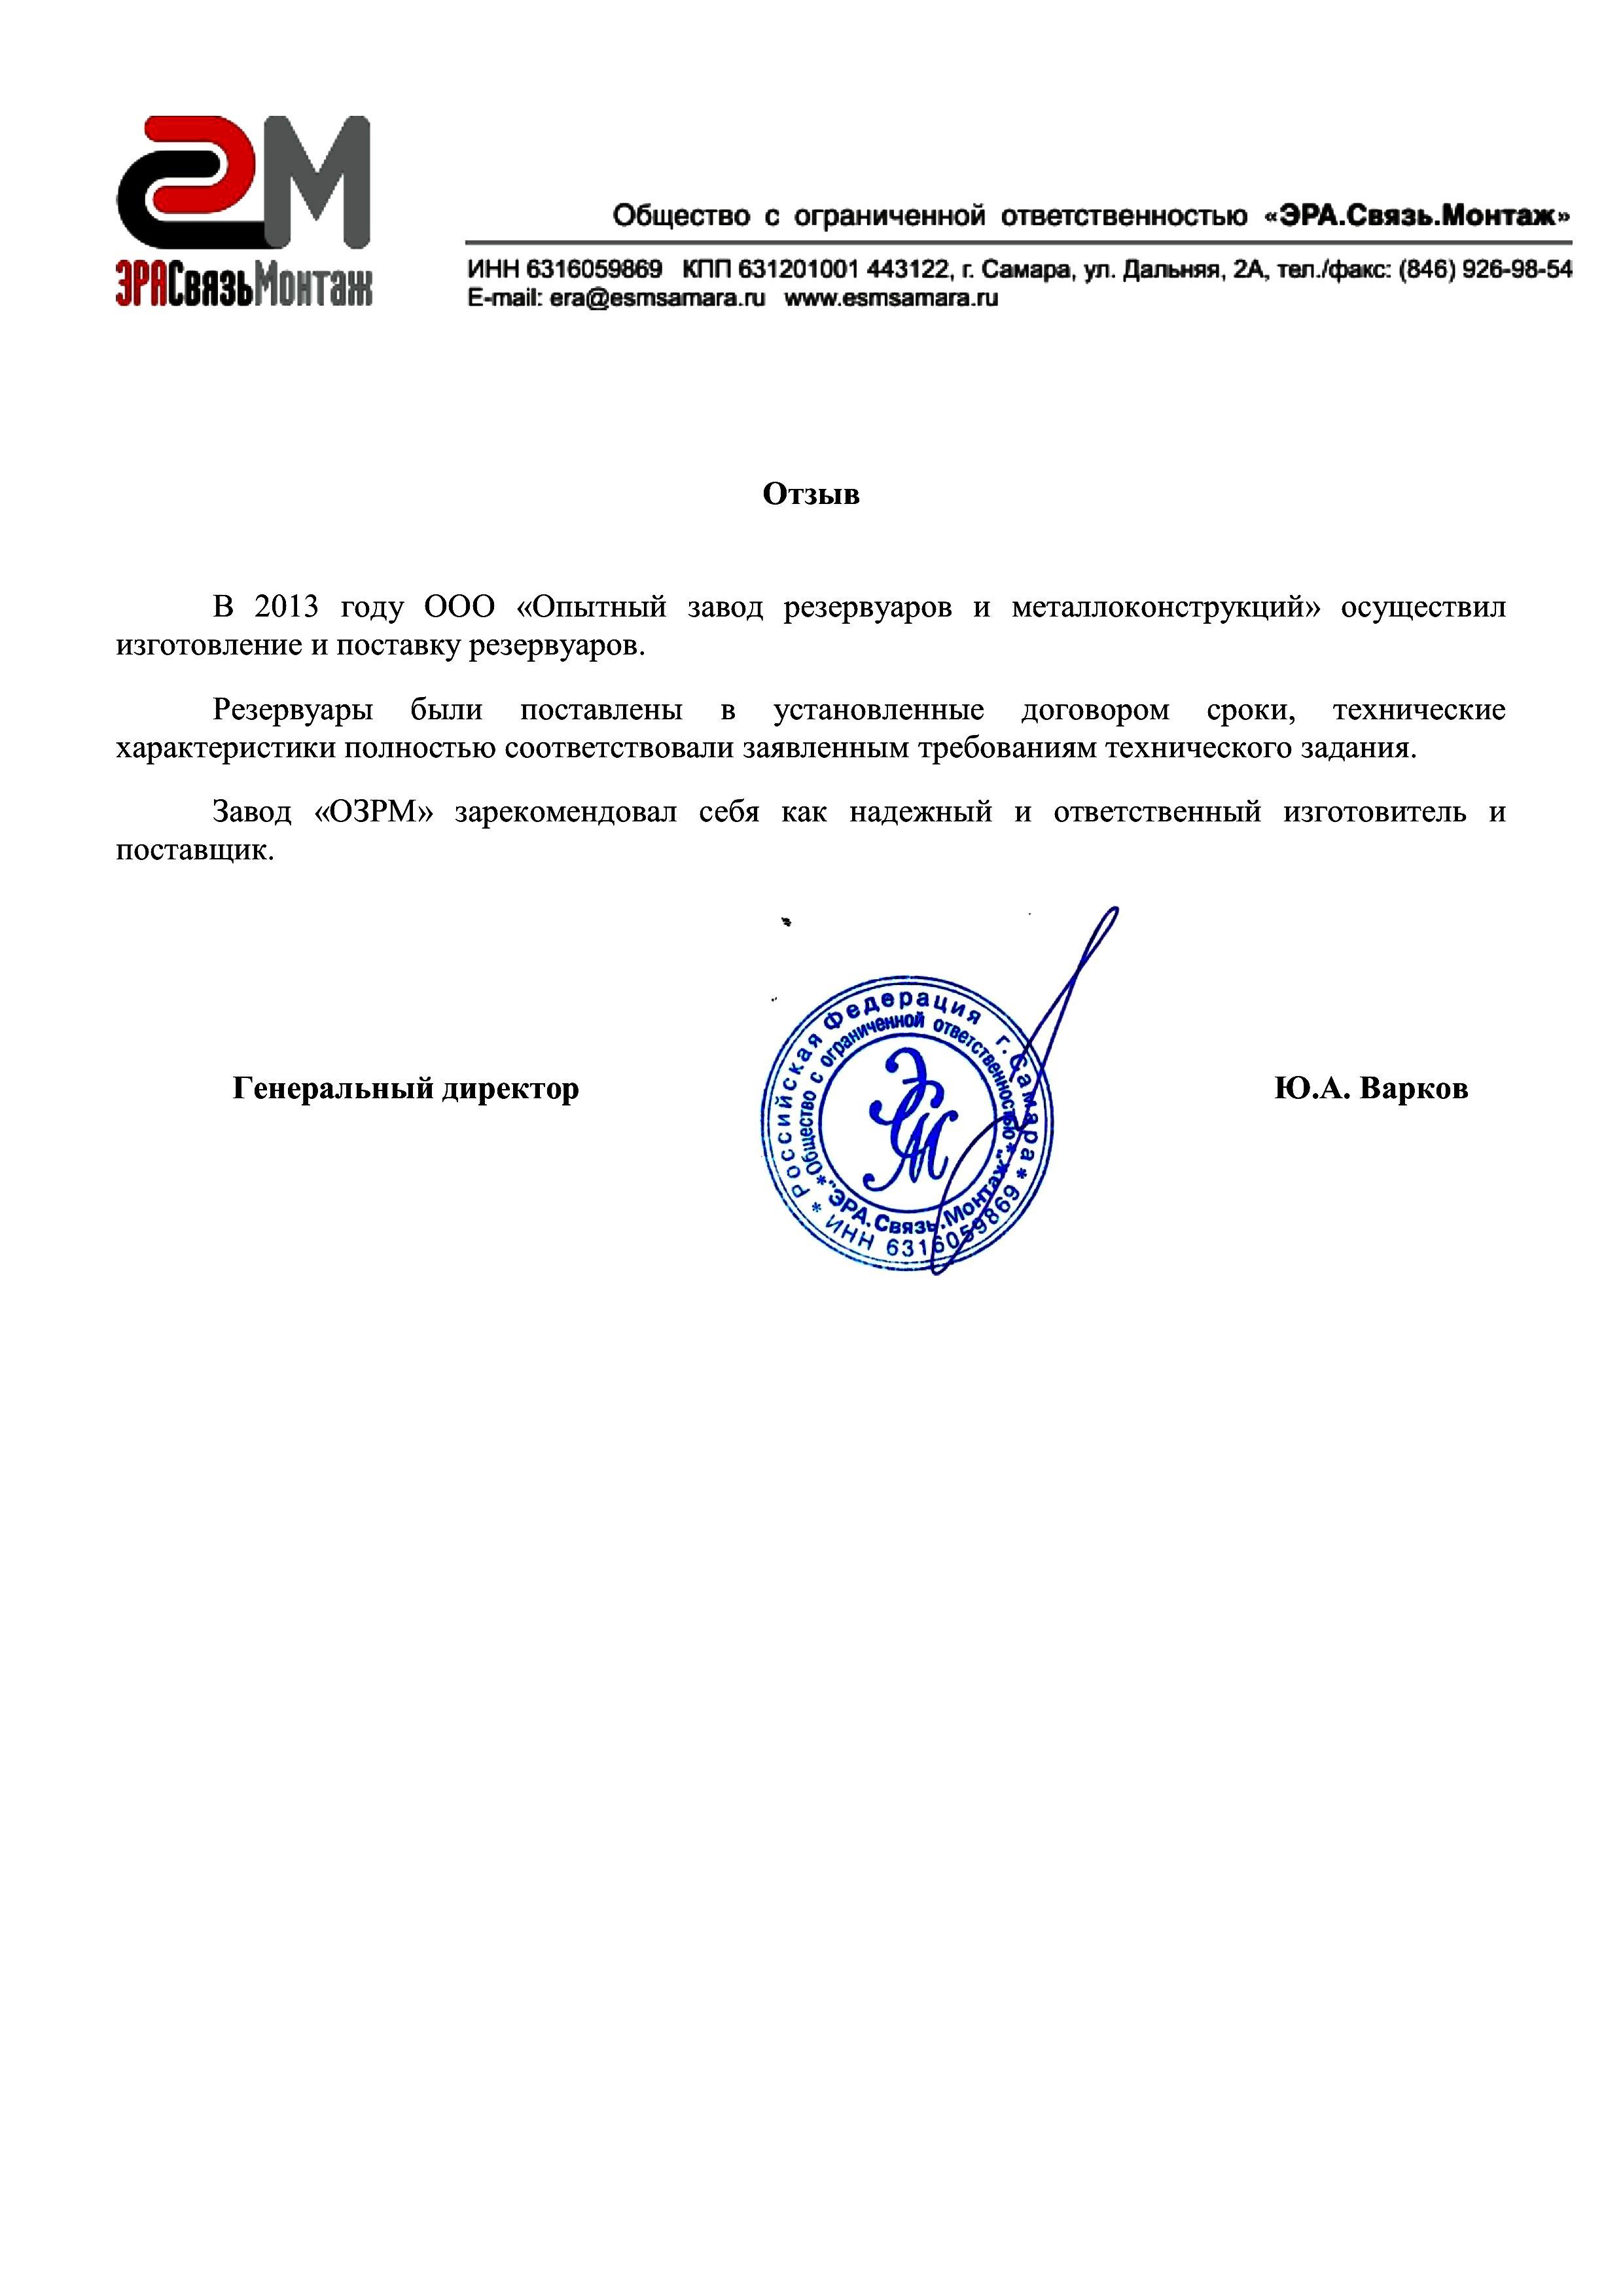 "Отзыв ООО ""ЭРА.Связь.Монтаж"""